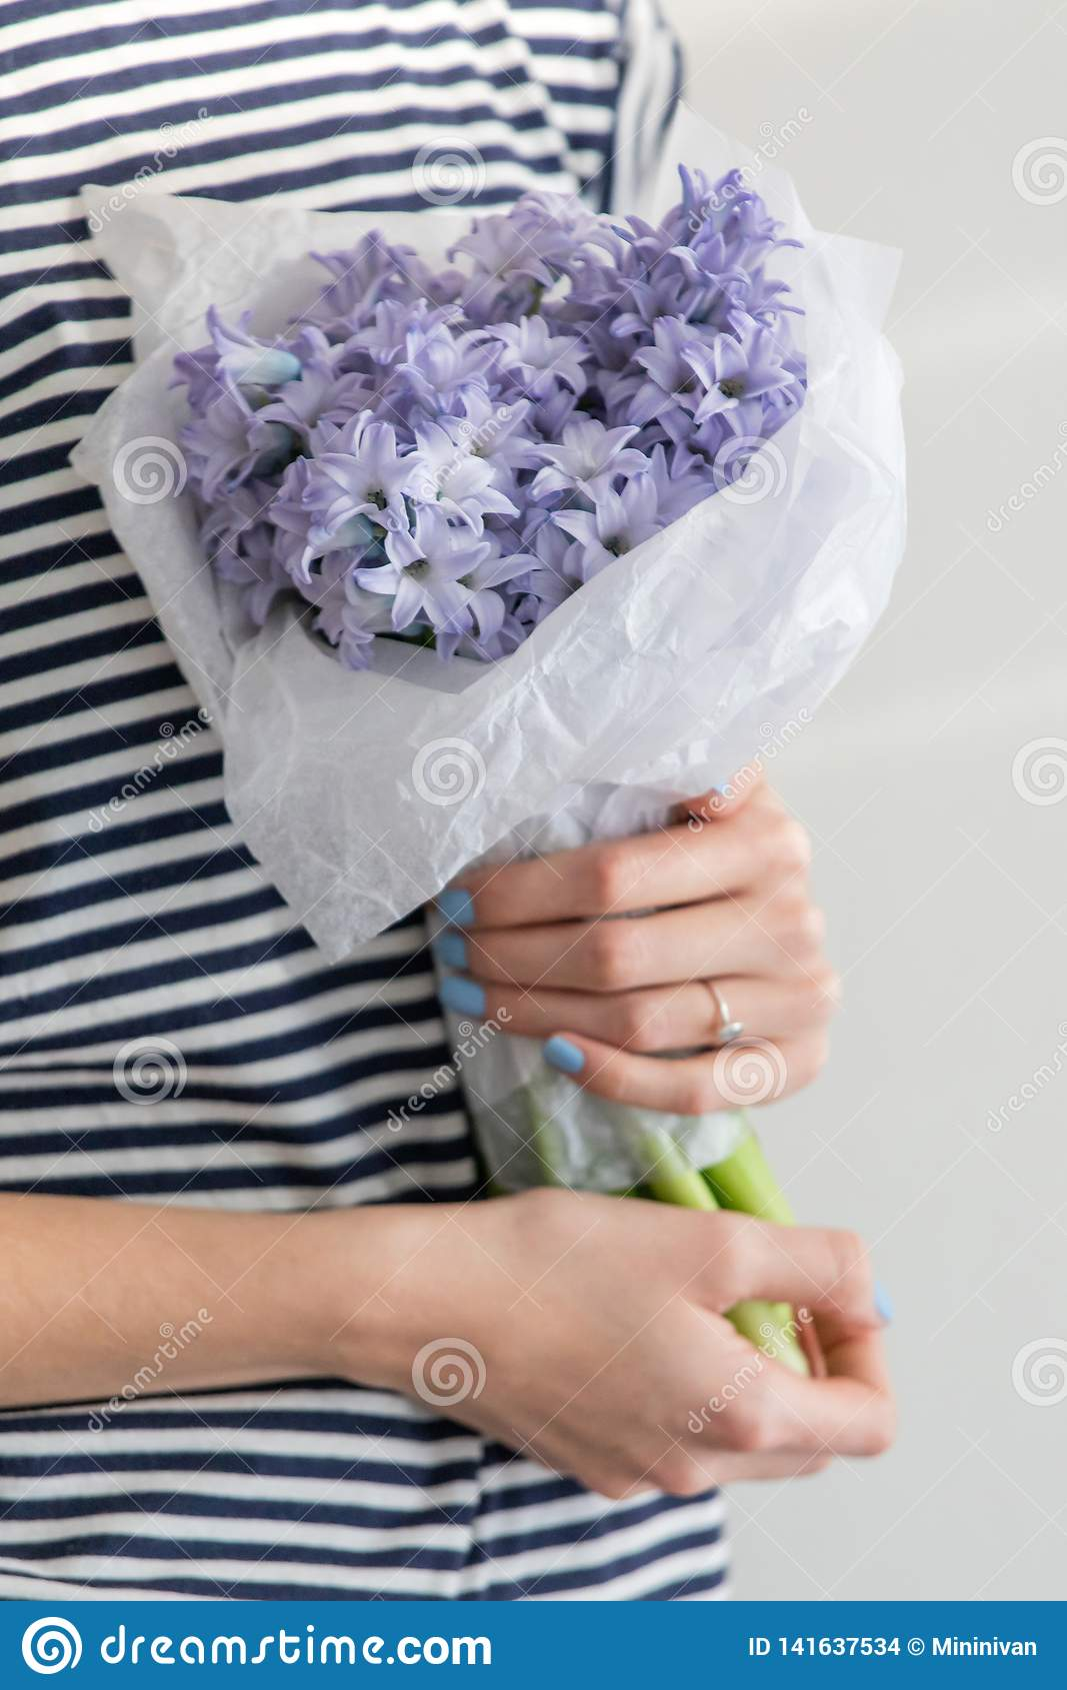 GirlHolding Little Bouquet Of Flowers Hyacinths